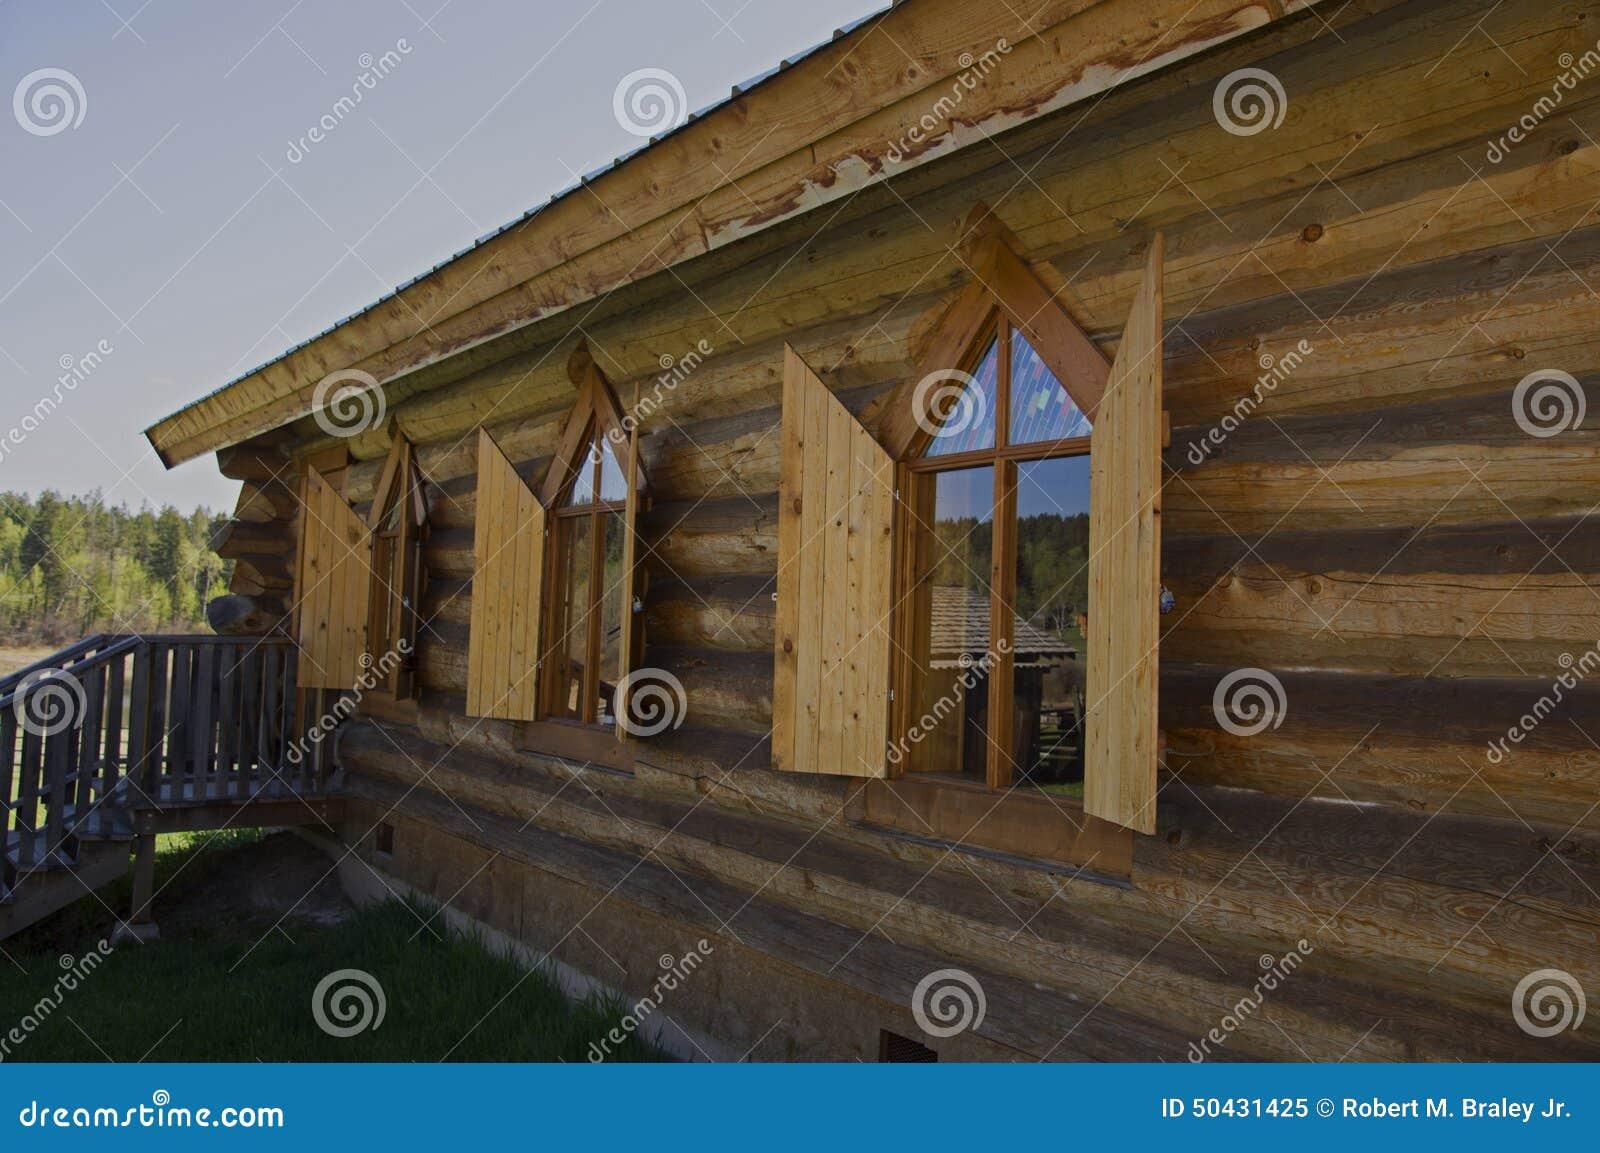 Vintage Log Church shutters